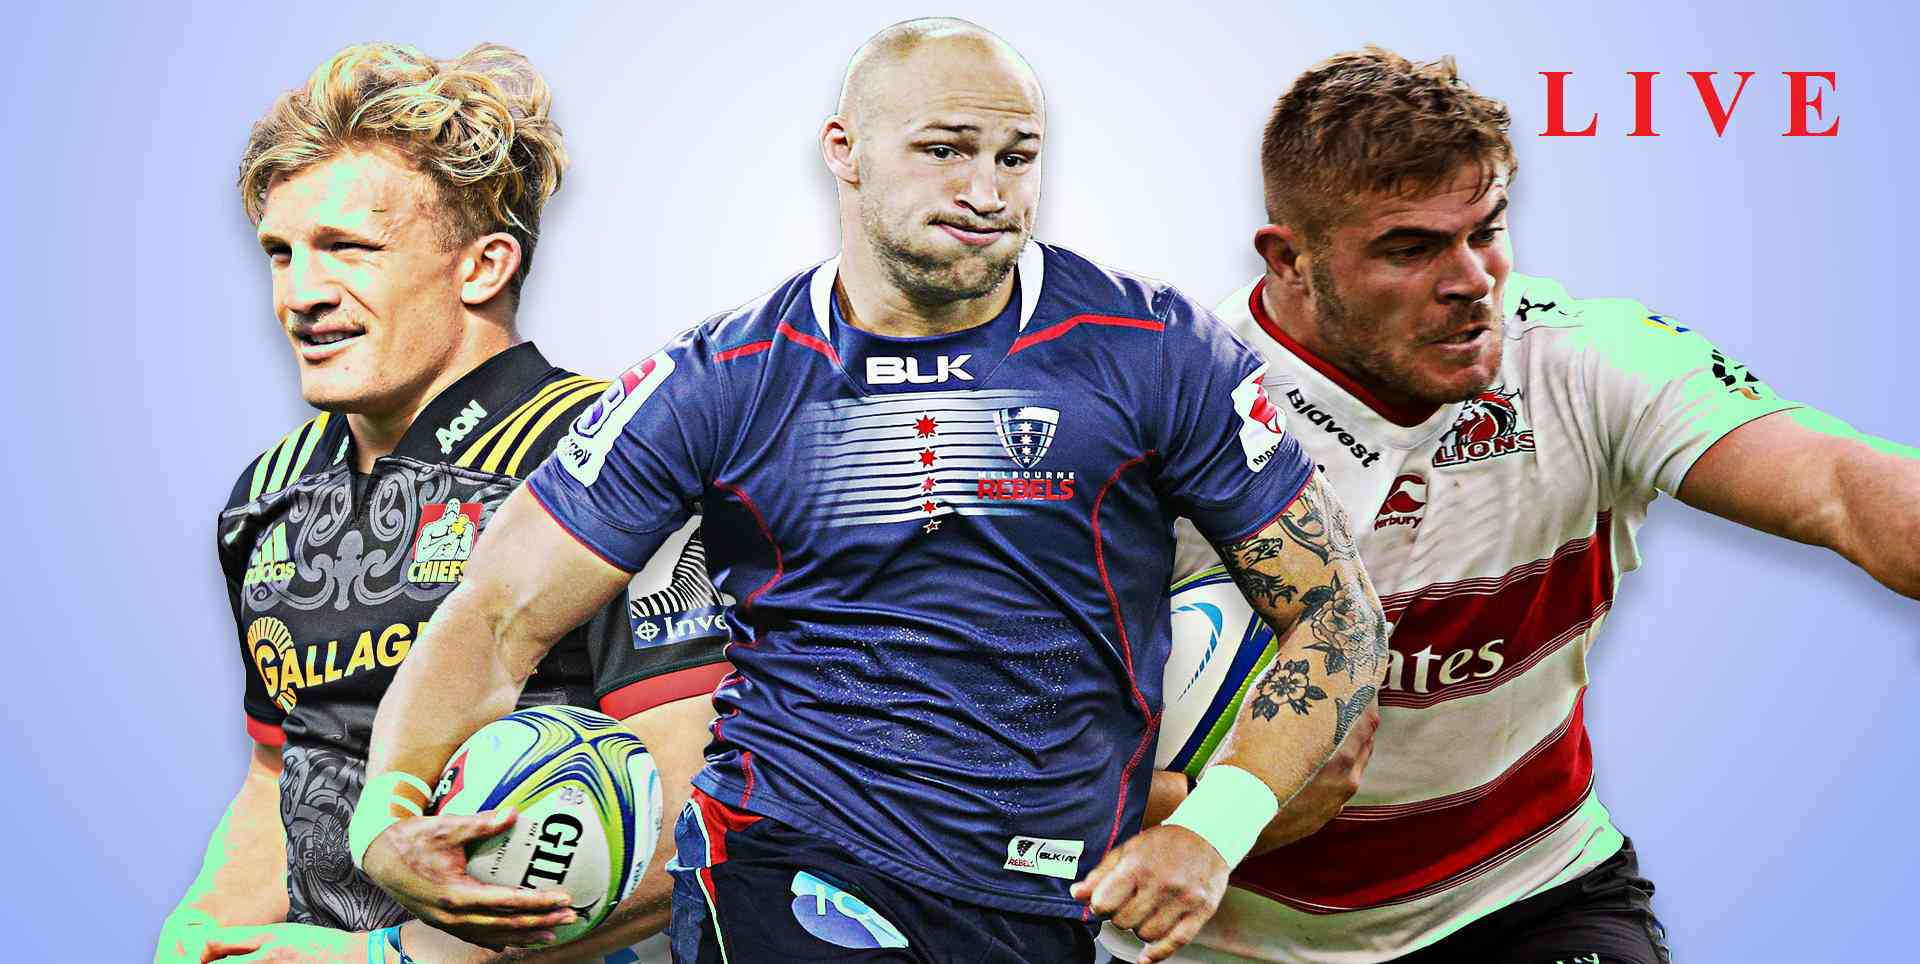 pau-vs-bath-rugby-live-coverage